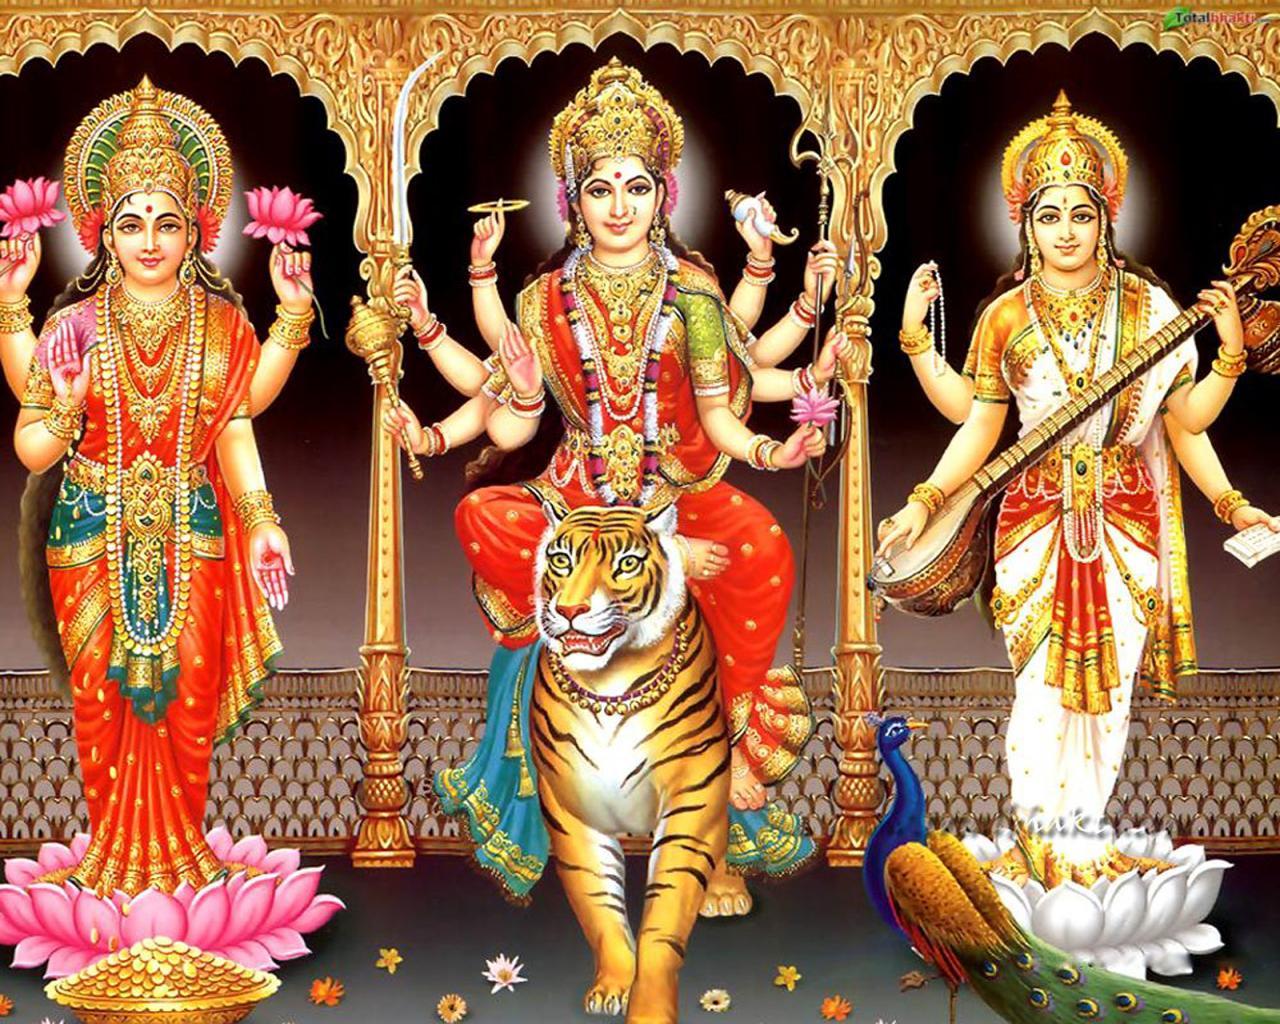 Vedic way to victory new year message by swami paramarthananda ji durga lakshmi saraswathi fandeluxe Image collections